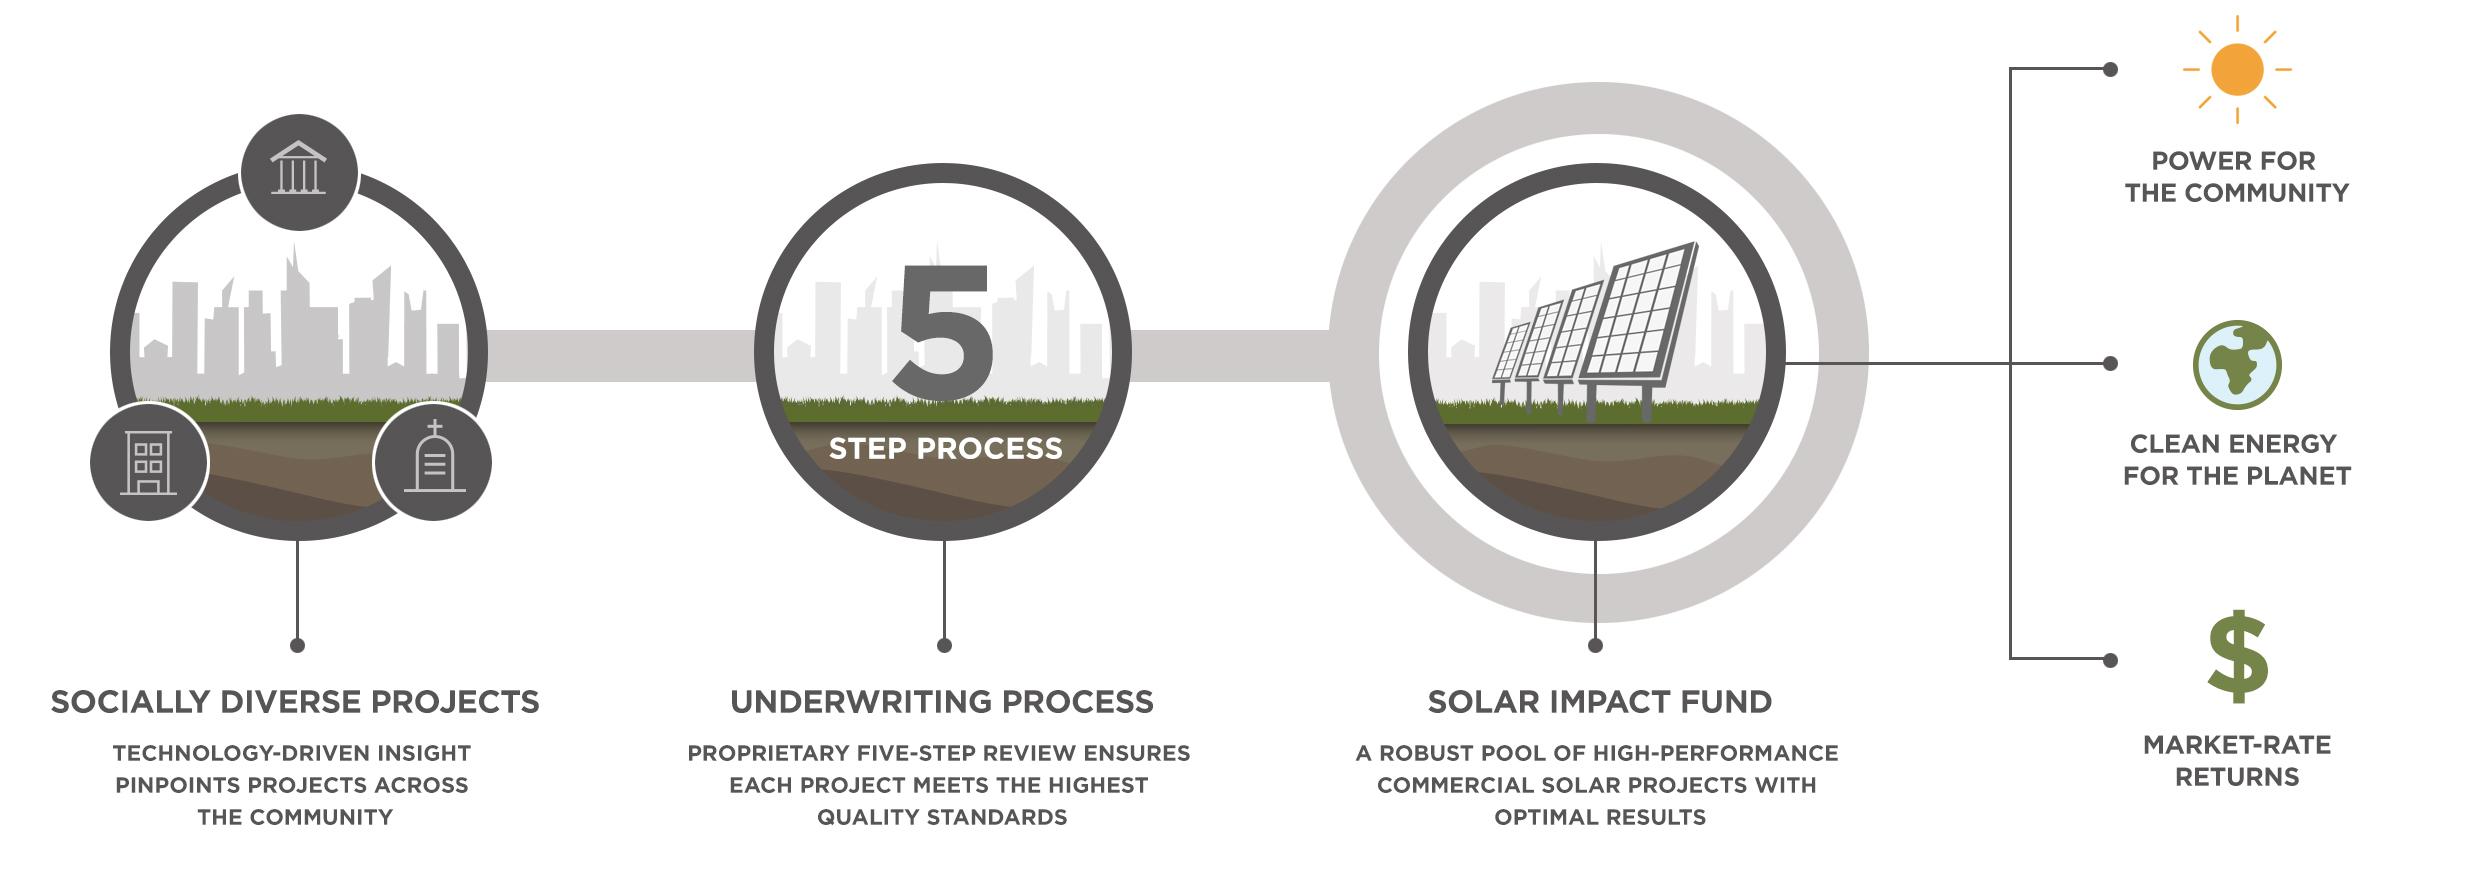 investing-in-solar-energy